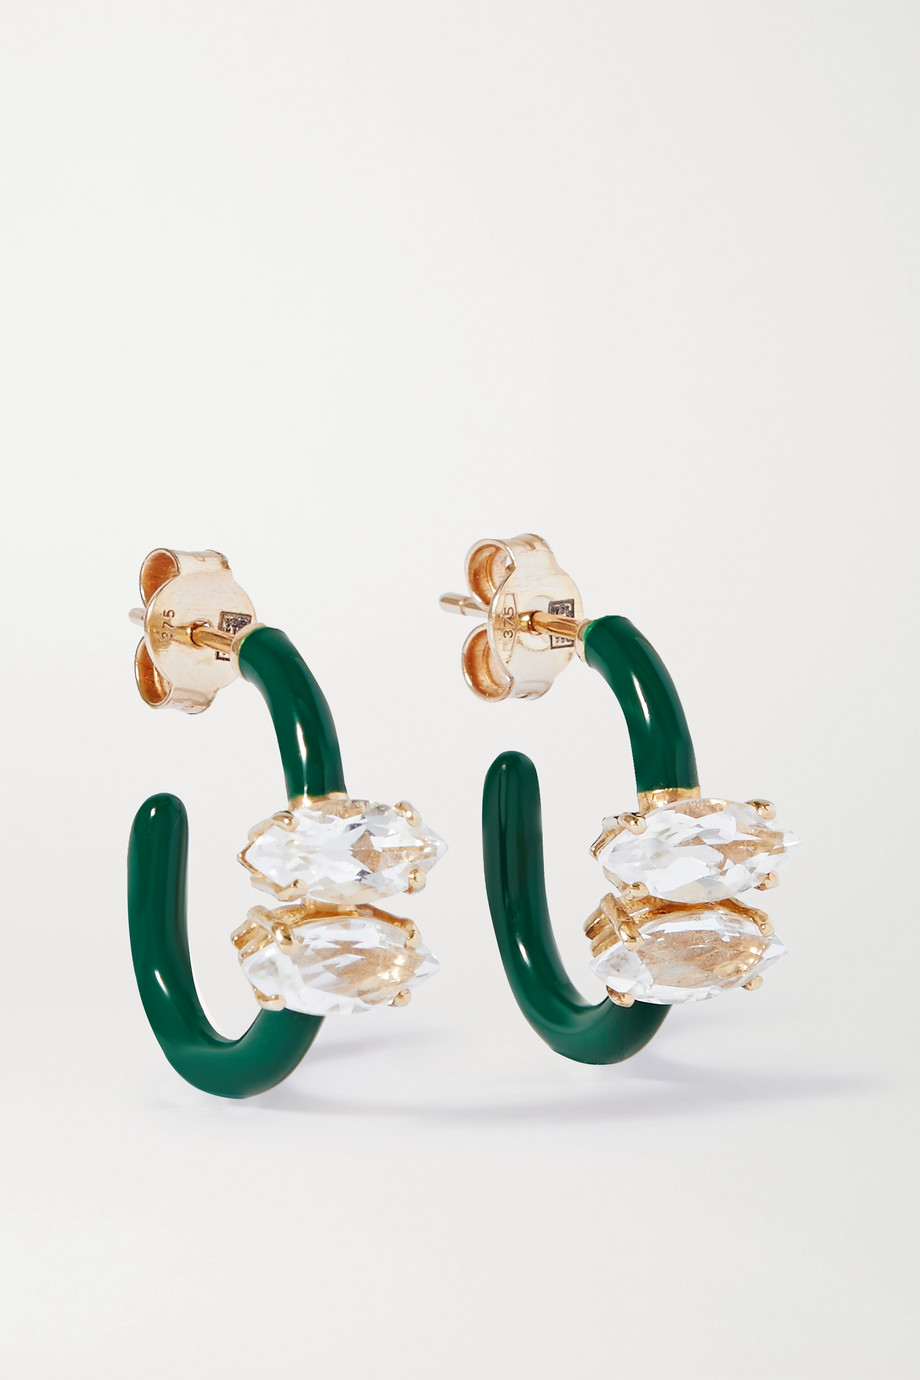 Bea Bongiasca Vine 9-karat gold, enamel and rock crystal earrings